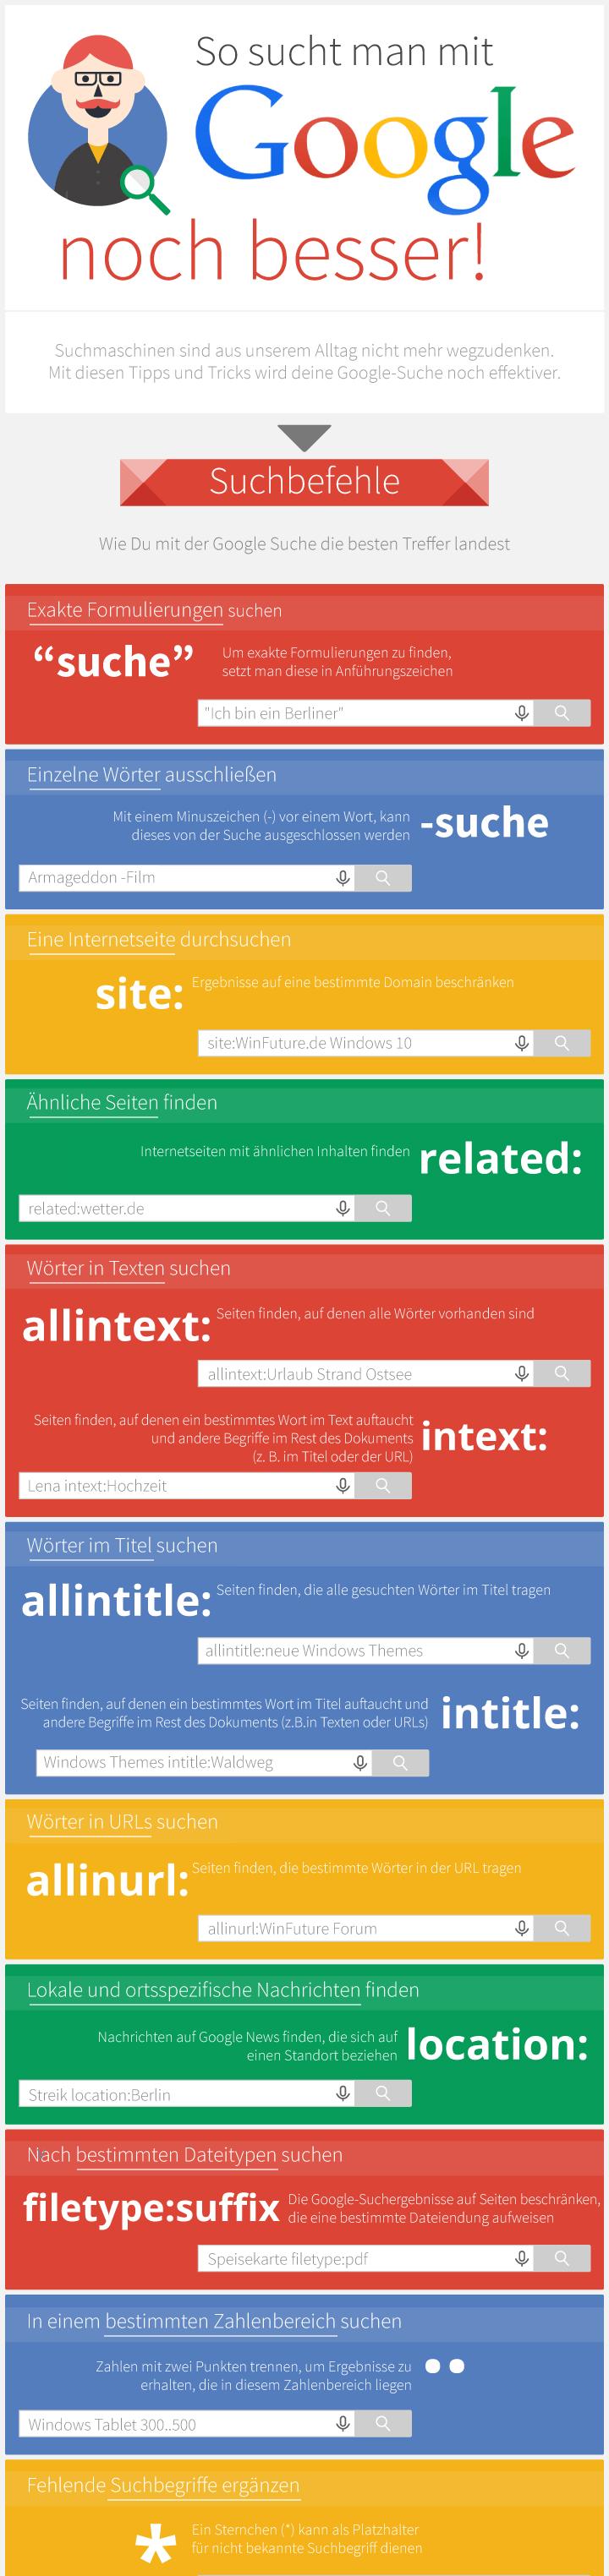 search1 keywords